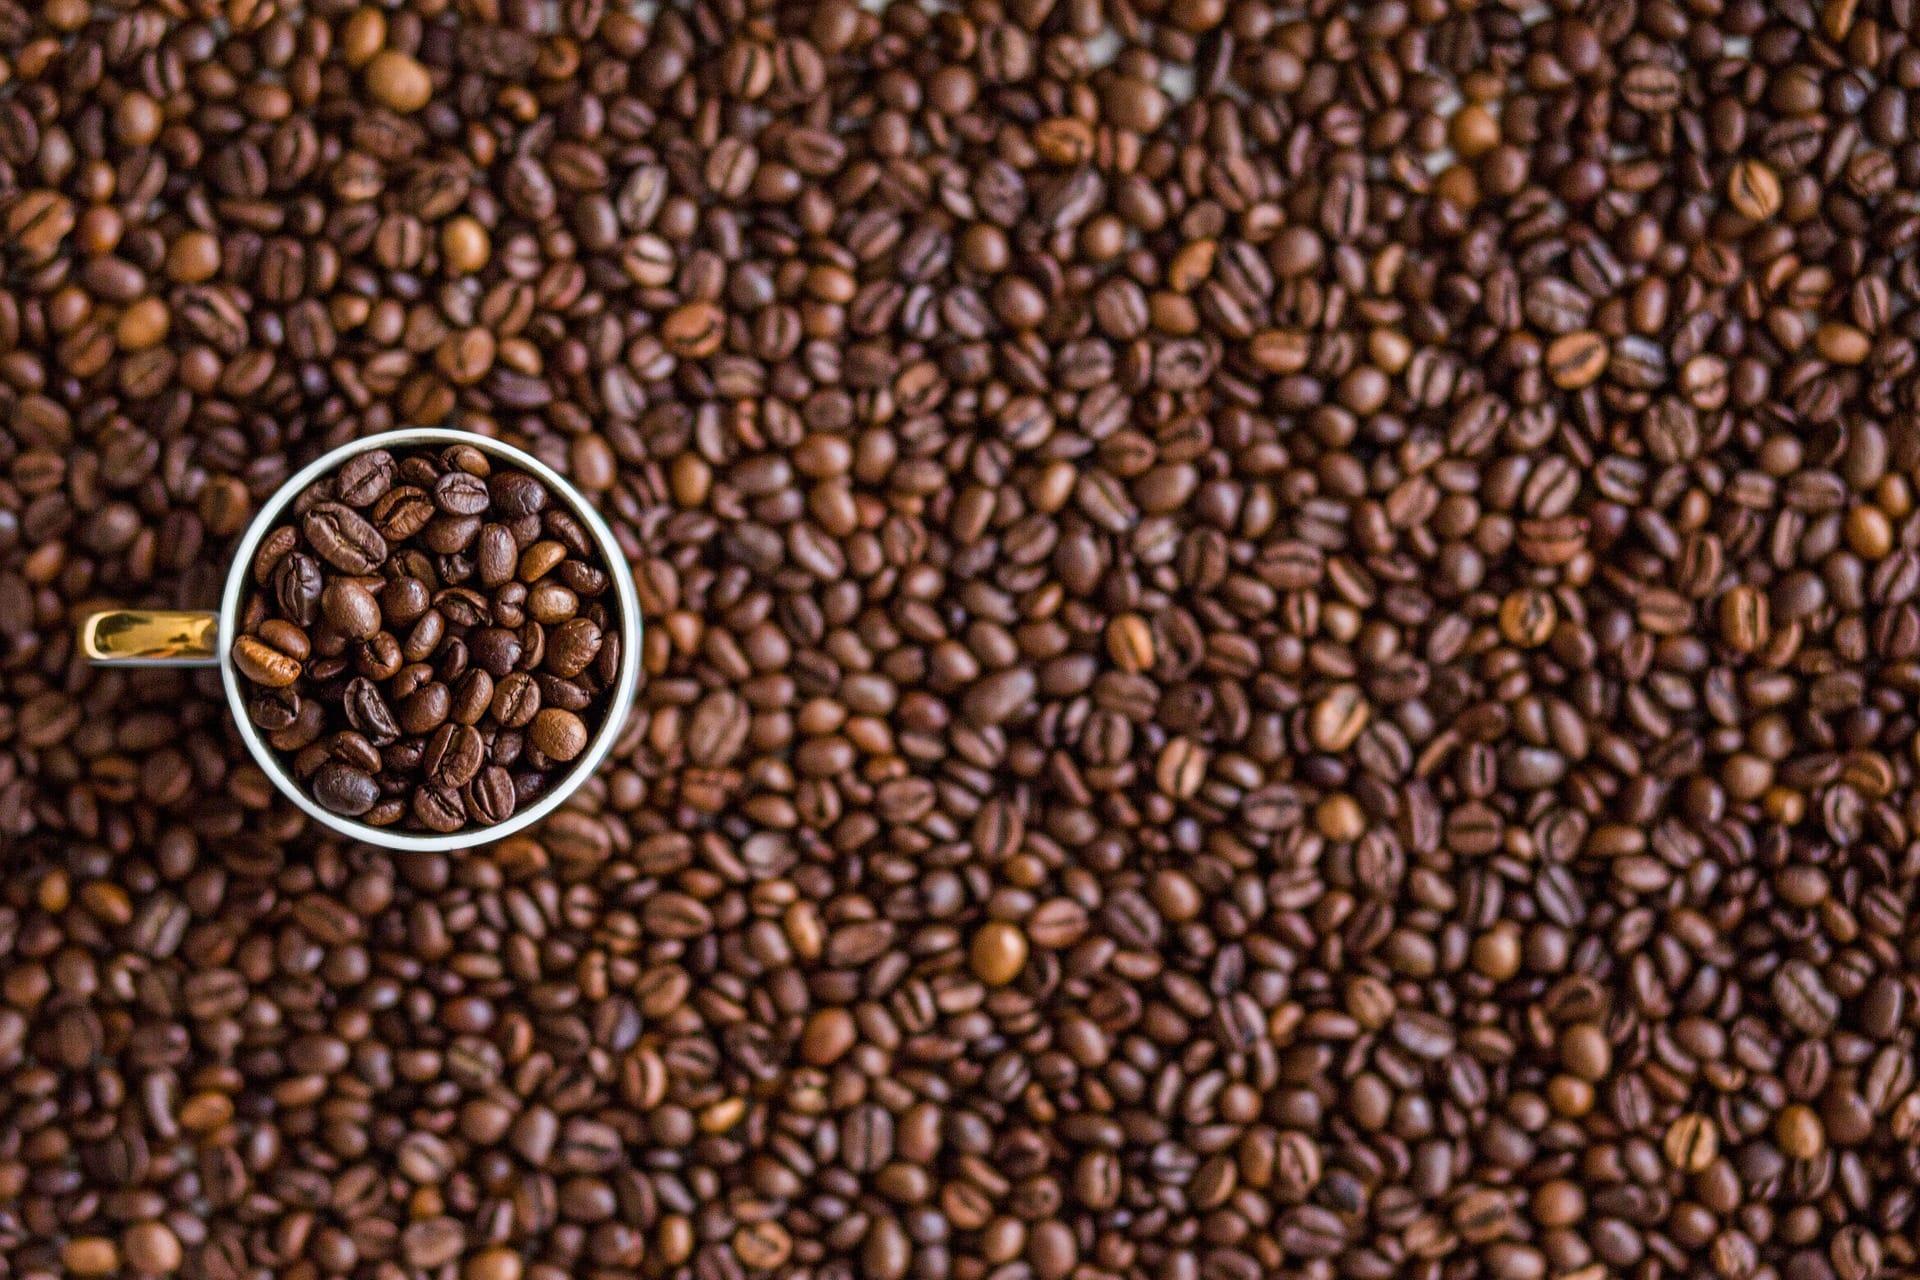 kaffe-kaffebönor-kaffekopp